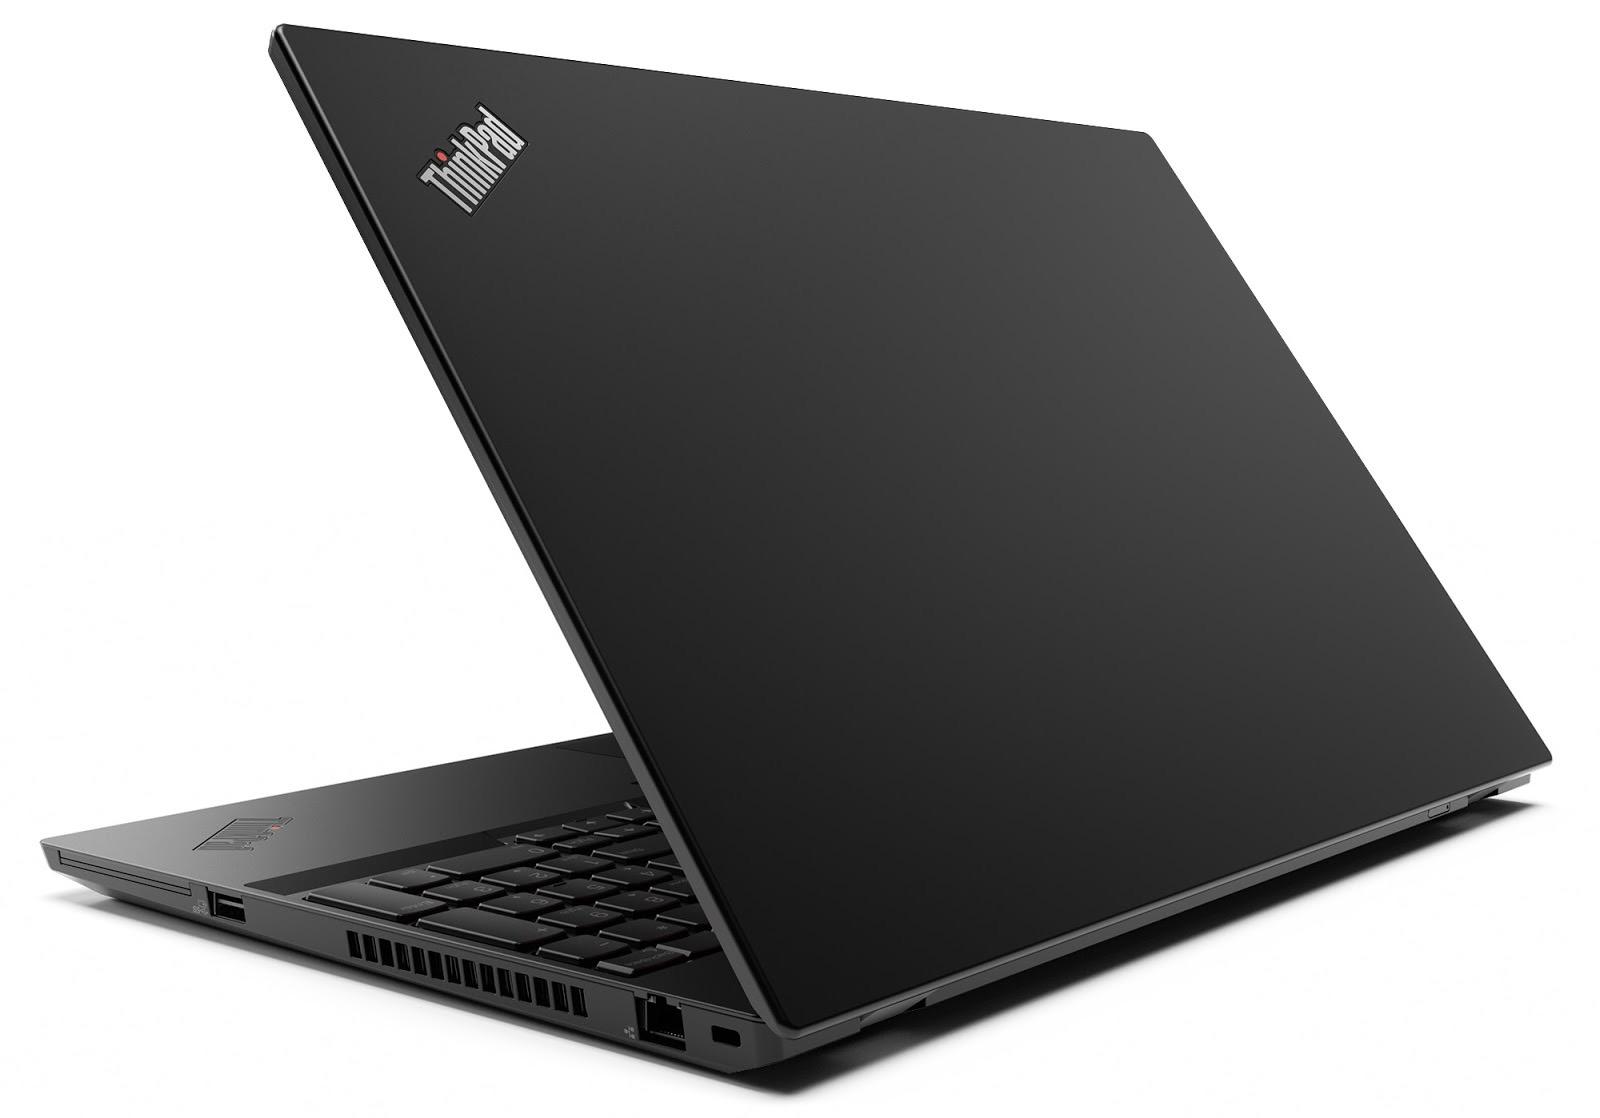 Фото 2. Ноутбук Lenovo ThinkPad T15 Gen 1 Black (20S60045RT)